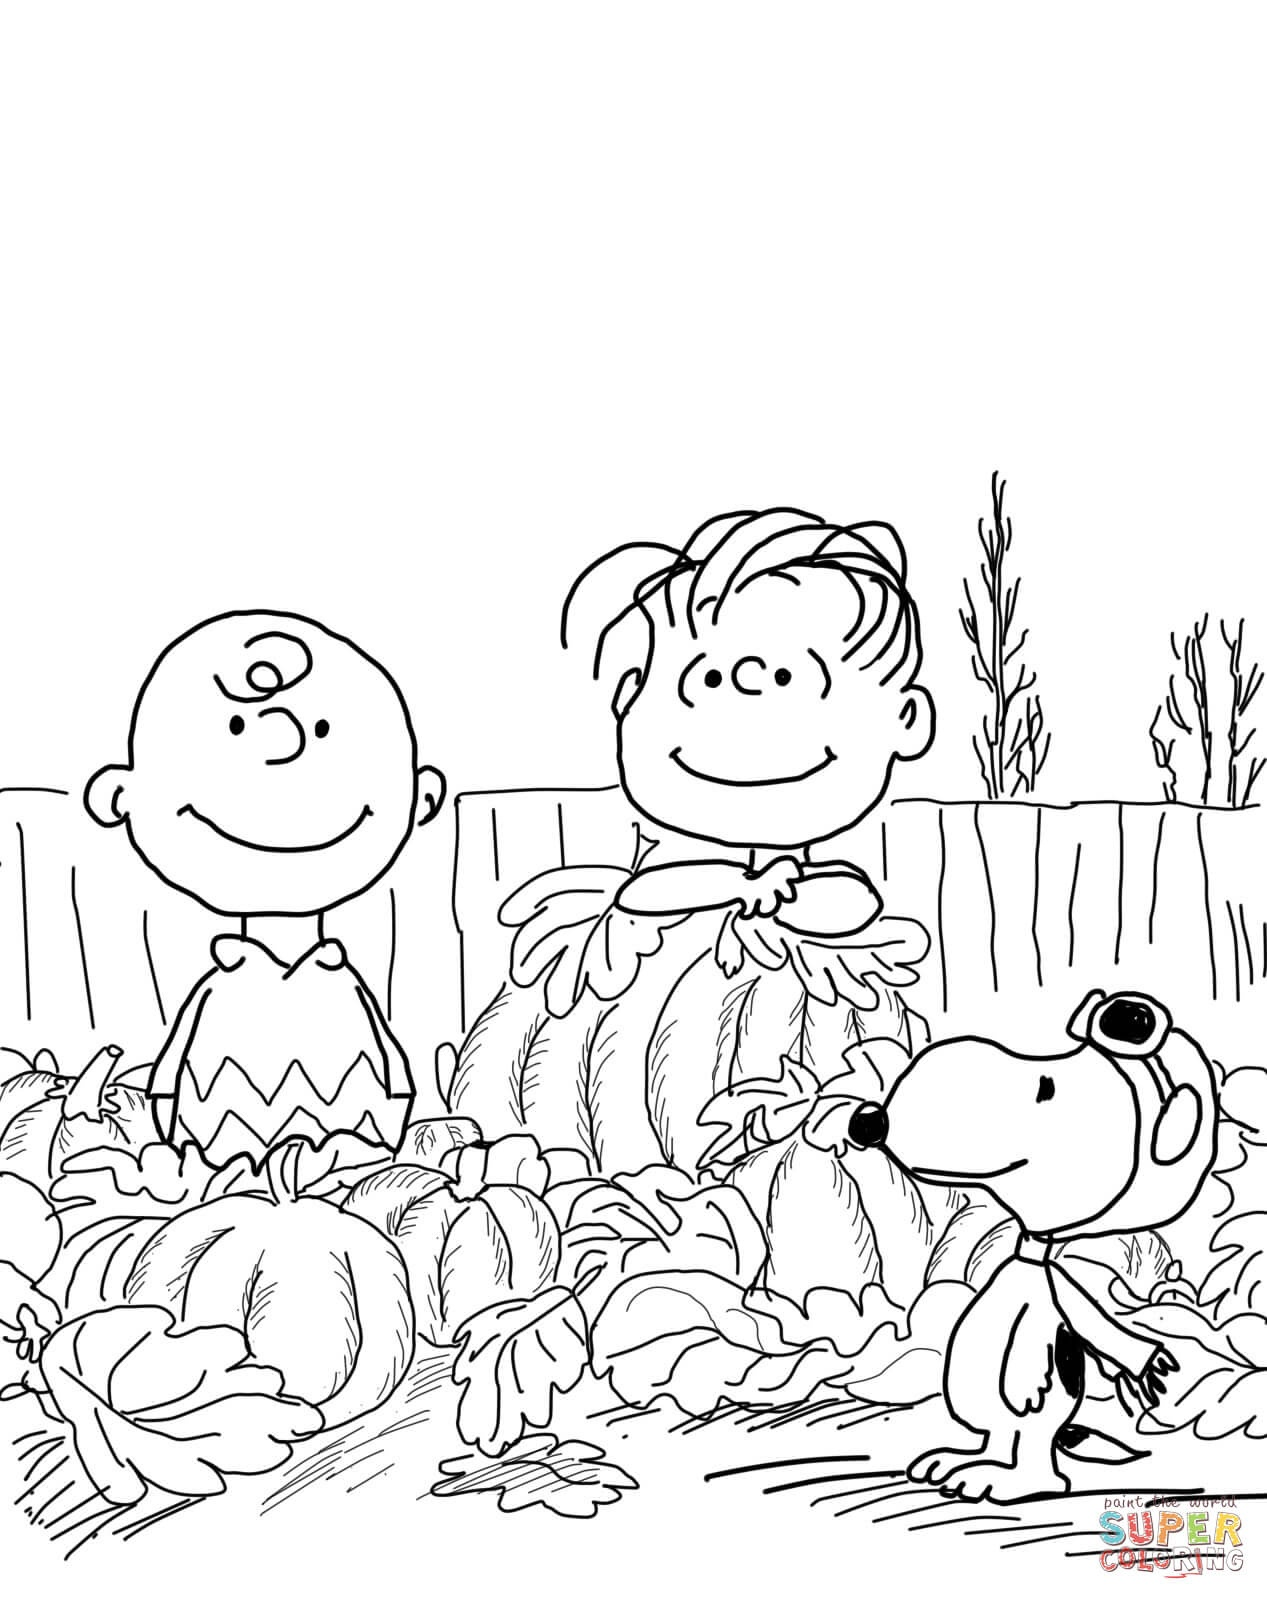 Awesome Free Printable Charlie Brown Halloween Coloring Pages - Free Printable Charlie Brown Halloween Coloring Pages